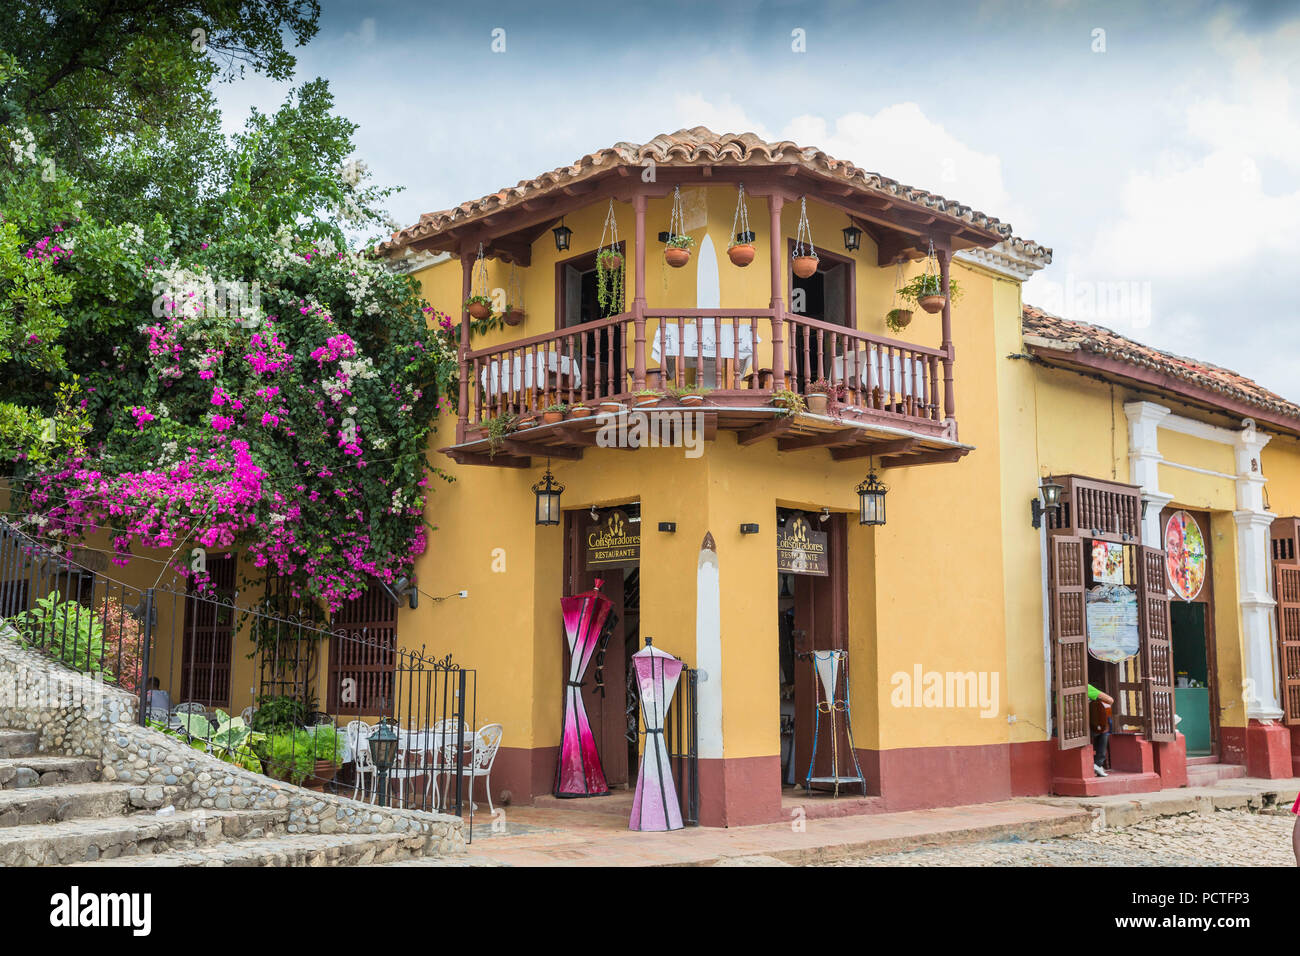 Restaurant Los Conspiradores, Trinidad, Sancti Spiritus Province, Cuba, Republic of Cuba, Greater Antilles, Caribbean - Stock Image